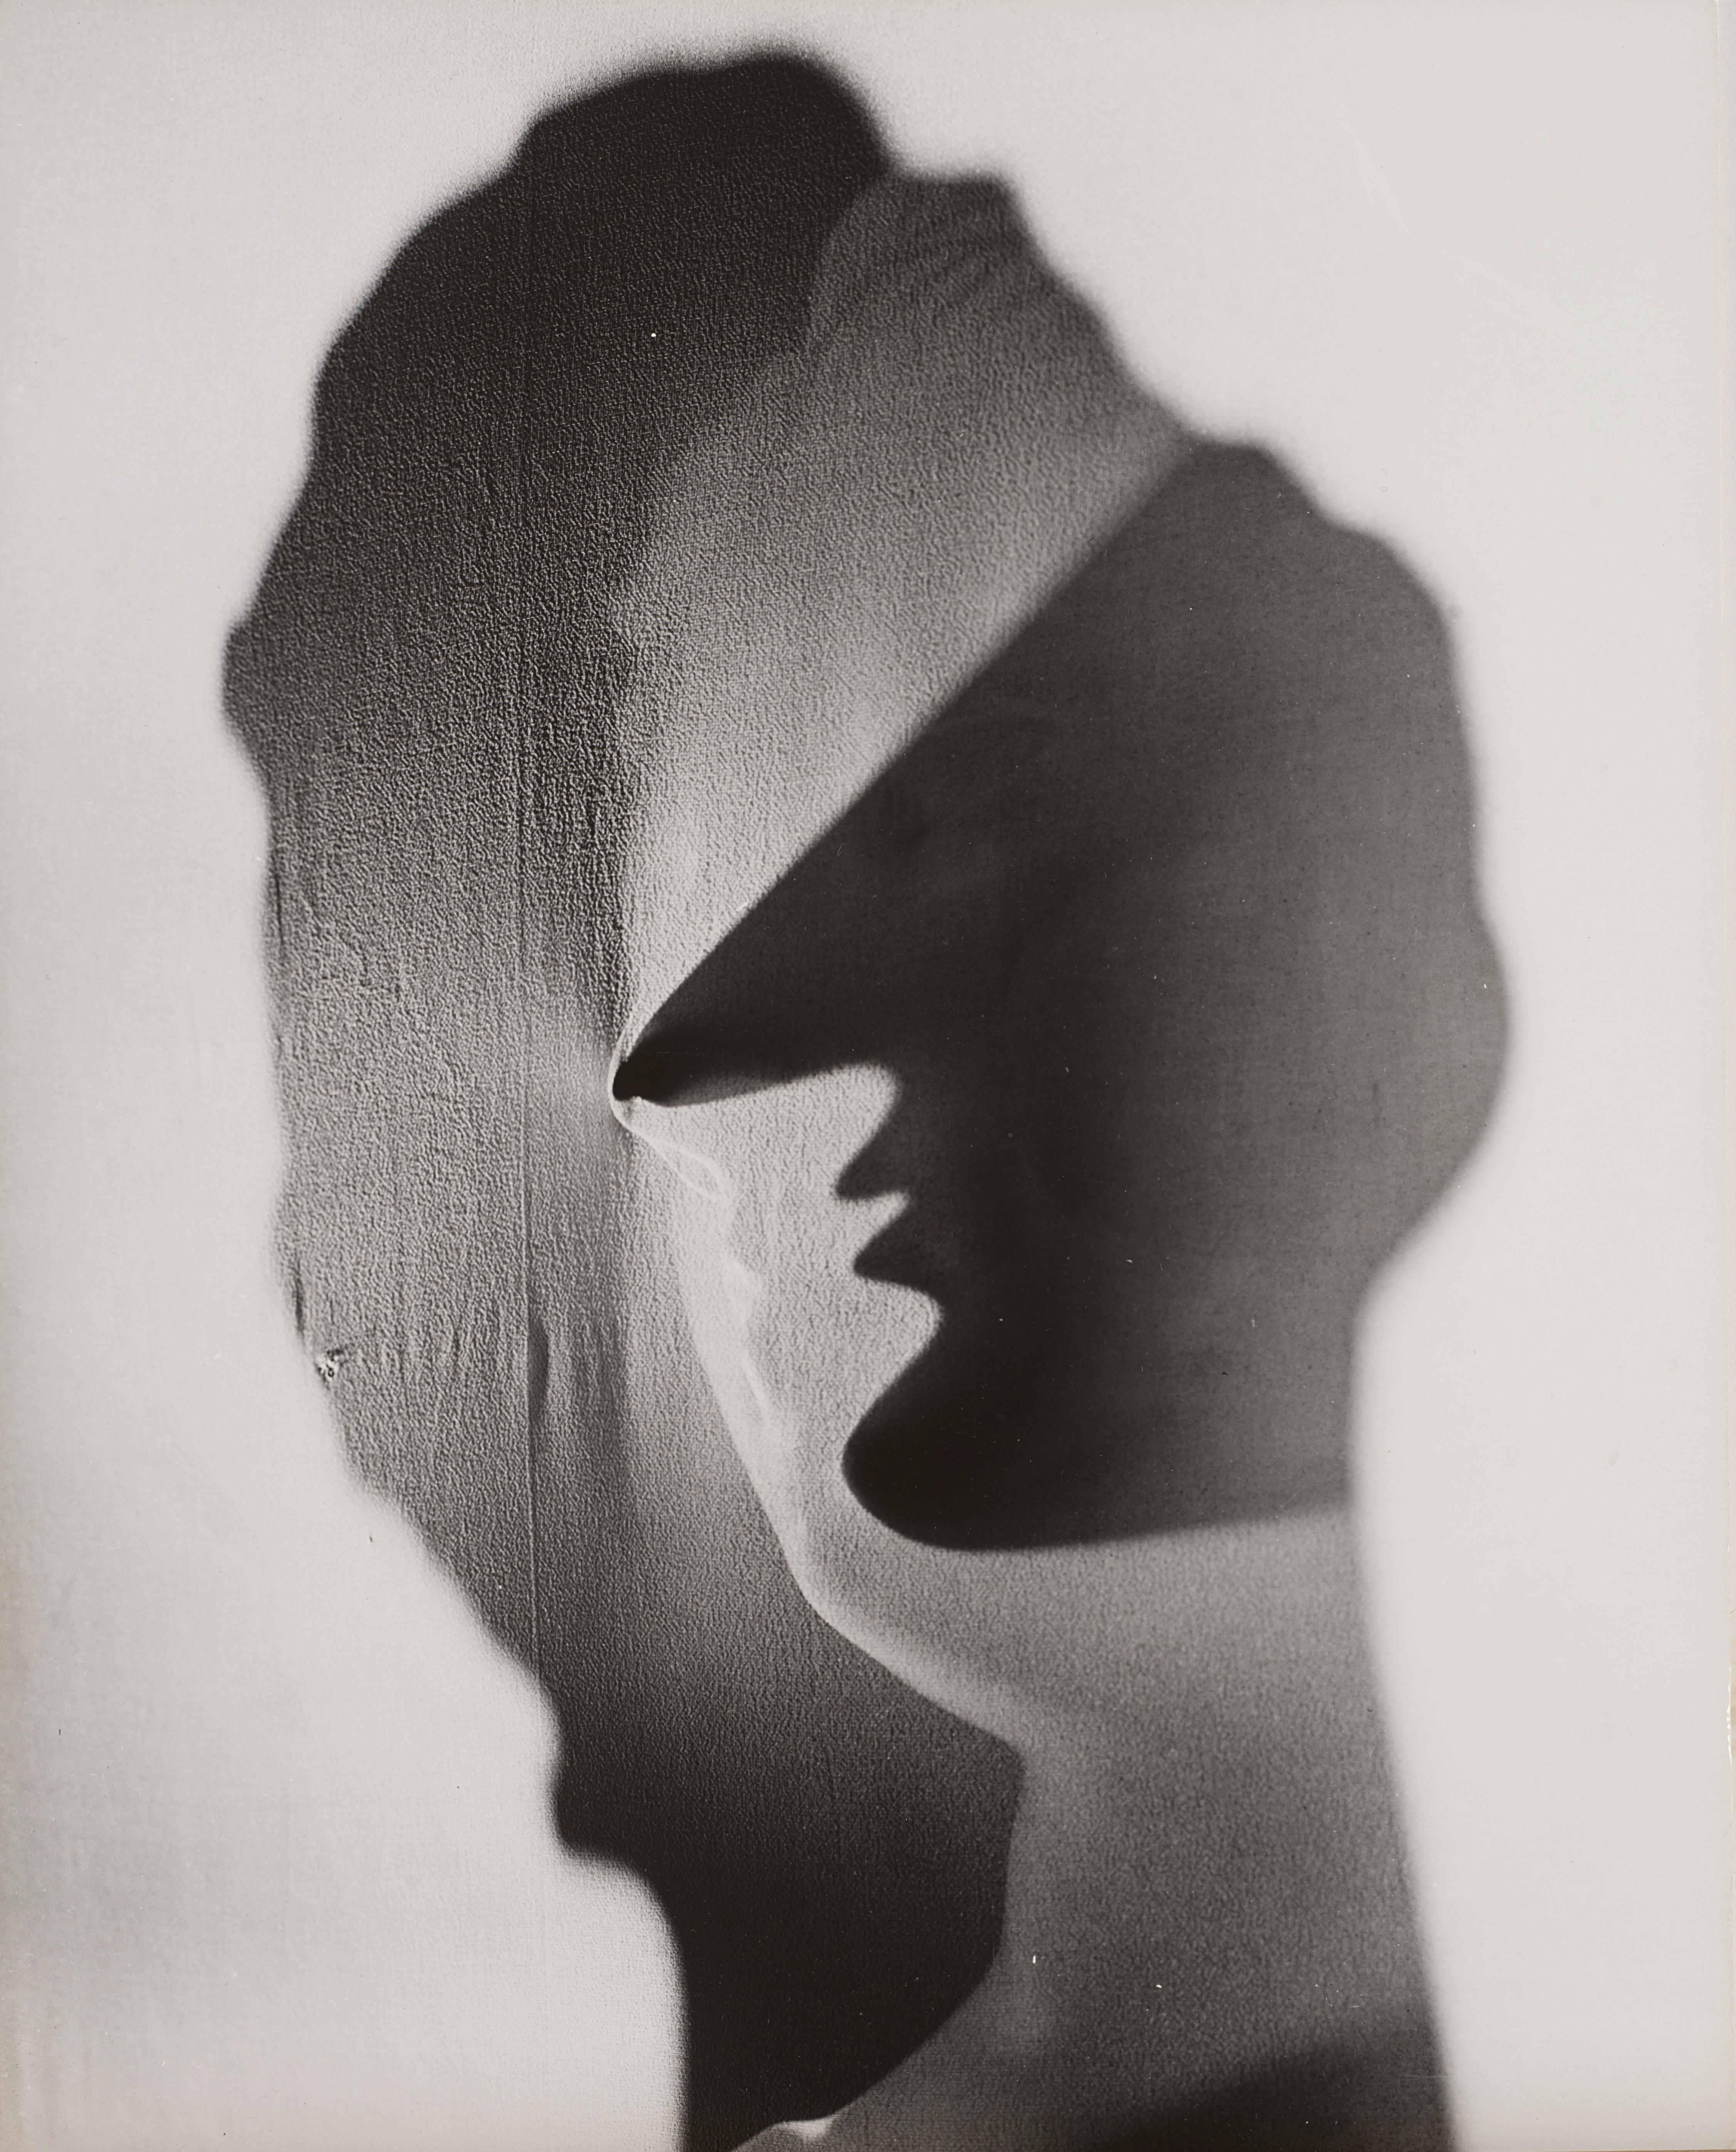 Untitled, NYC, Erwin Blumenfeld. 1945, Vintage silver salt gelatin print applied to original cardboard, 34.1 cm x 26.8, € 12.000 - 15.000. Photo: Finarte